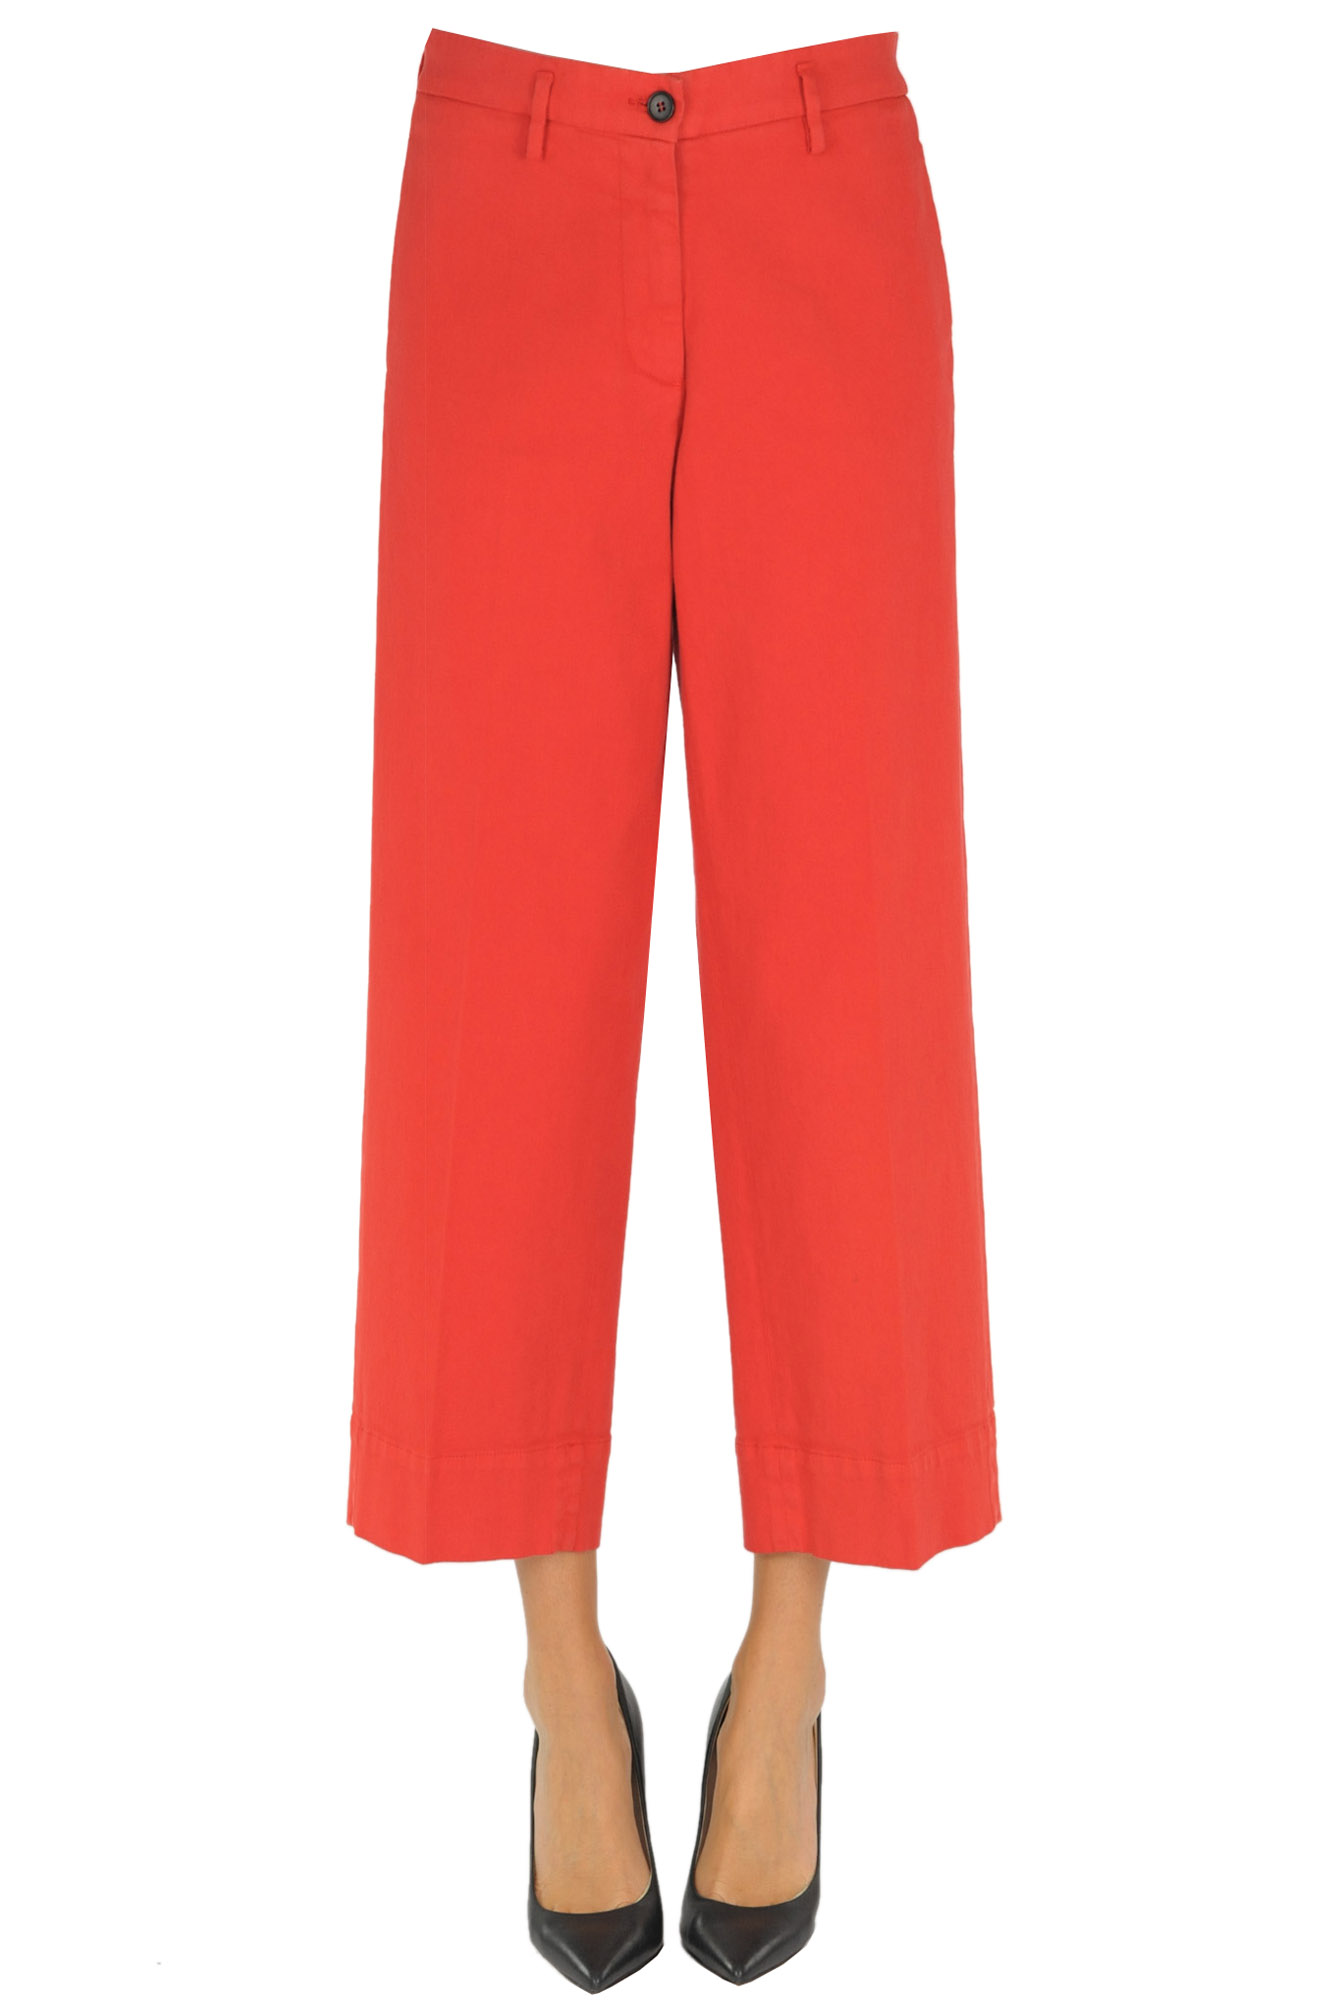 Pantaloni cropped in cotone